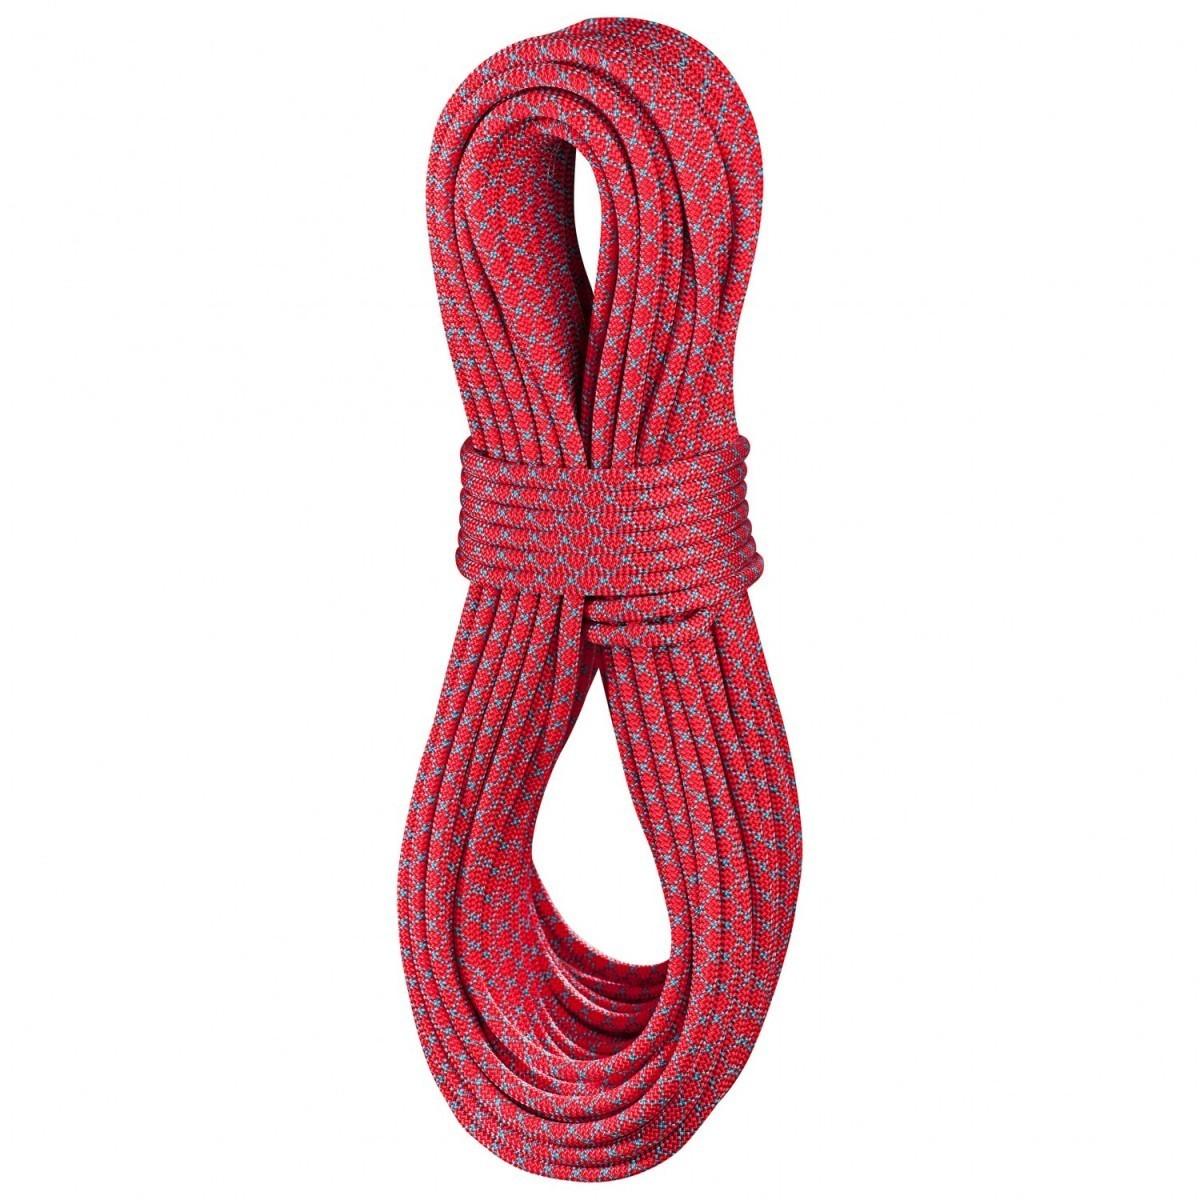 EDELRID エーデルリッド Swift 8.9mm (Red) 70m★ロープ・ザイル・登山・クライミング★